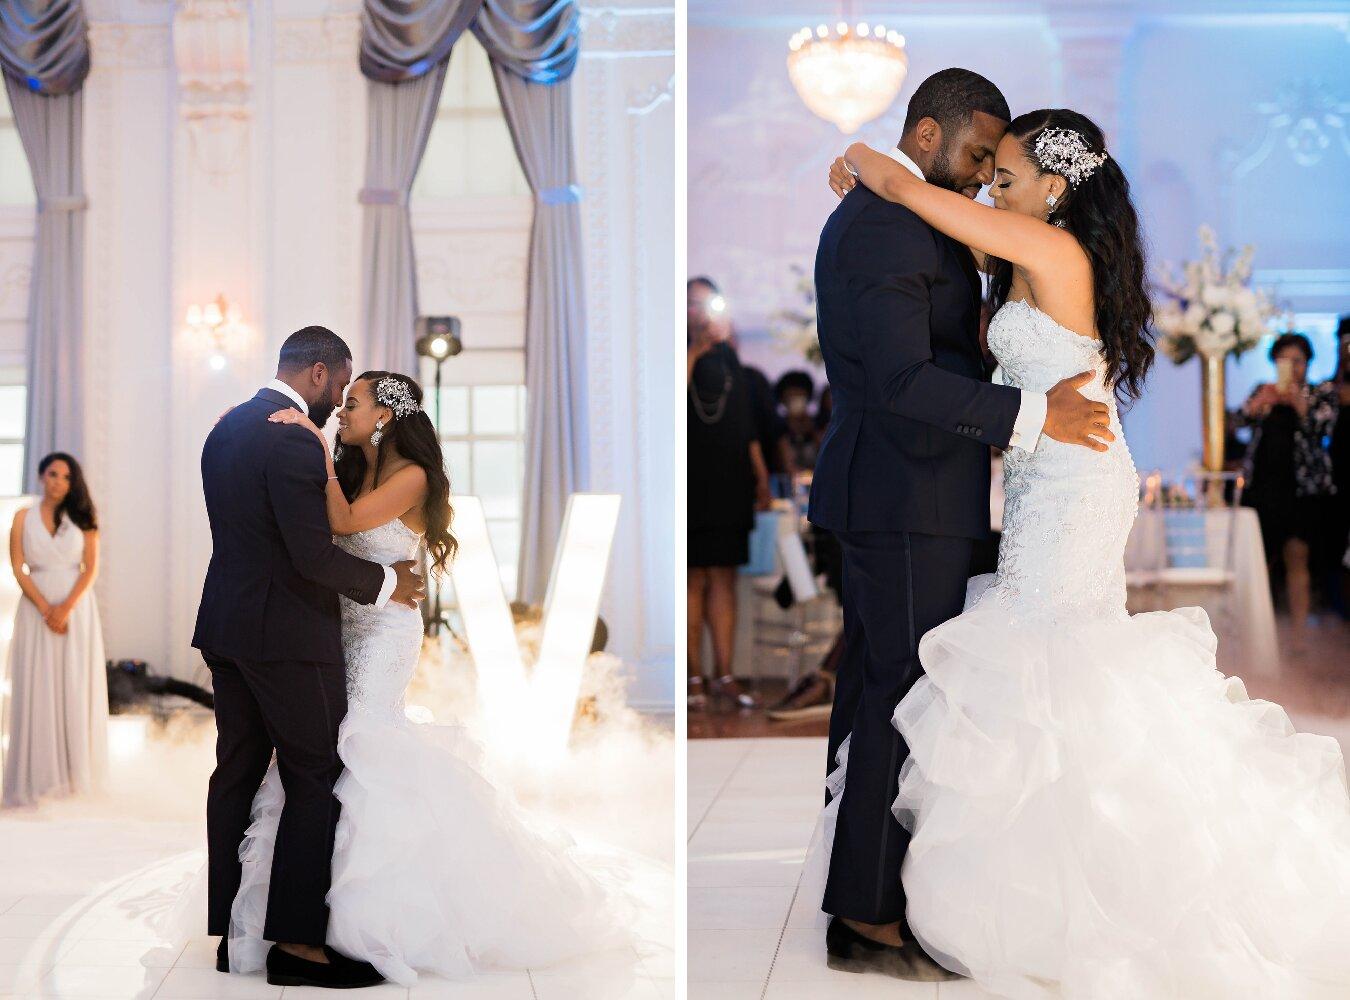 Tulsa Wedding- Pharris Photography- Reception- Darla + Quinton- First Dance